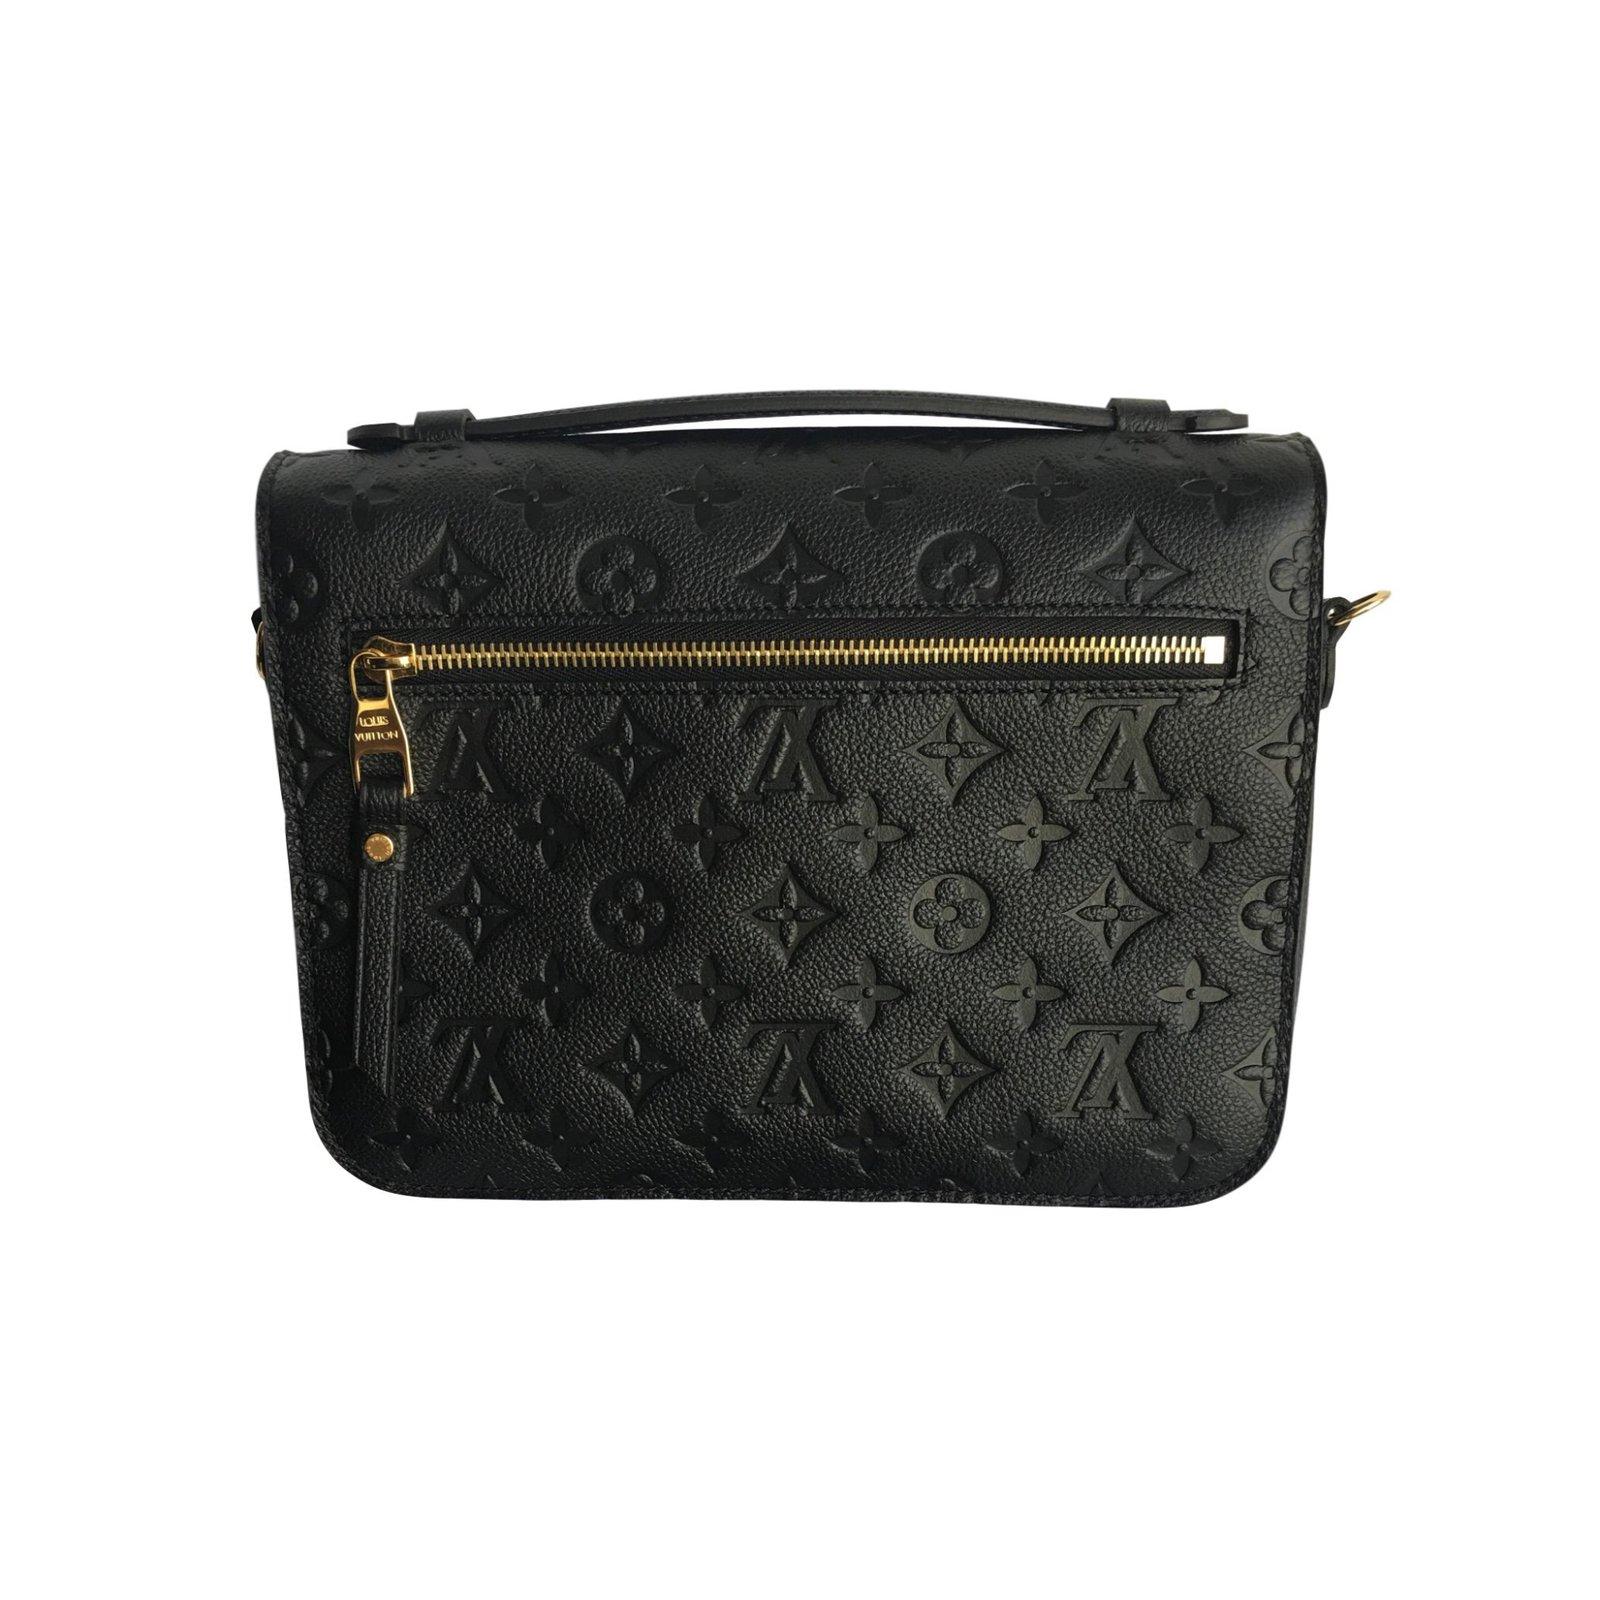 e62078b7005 Louis Vuitton Metis Monogram Empreinte Handbags Leather